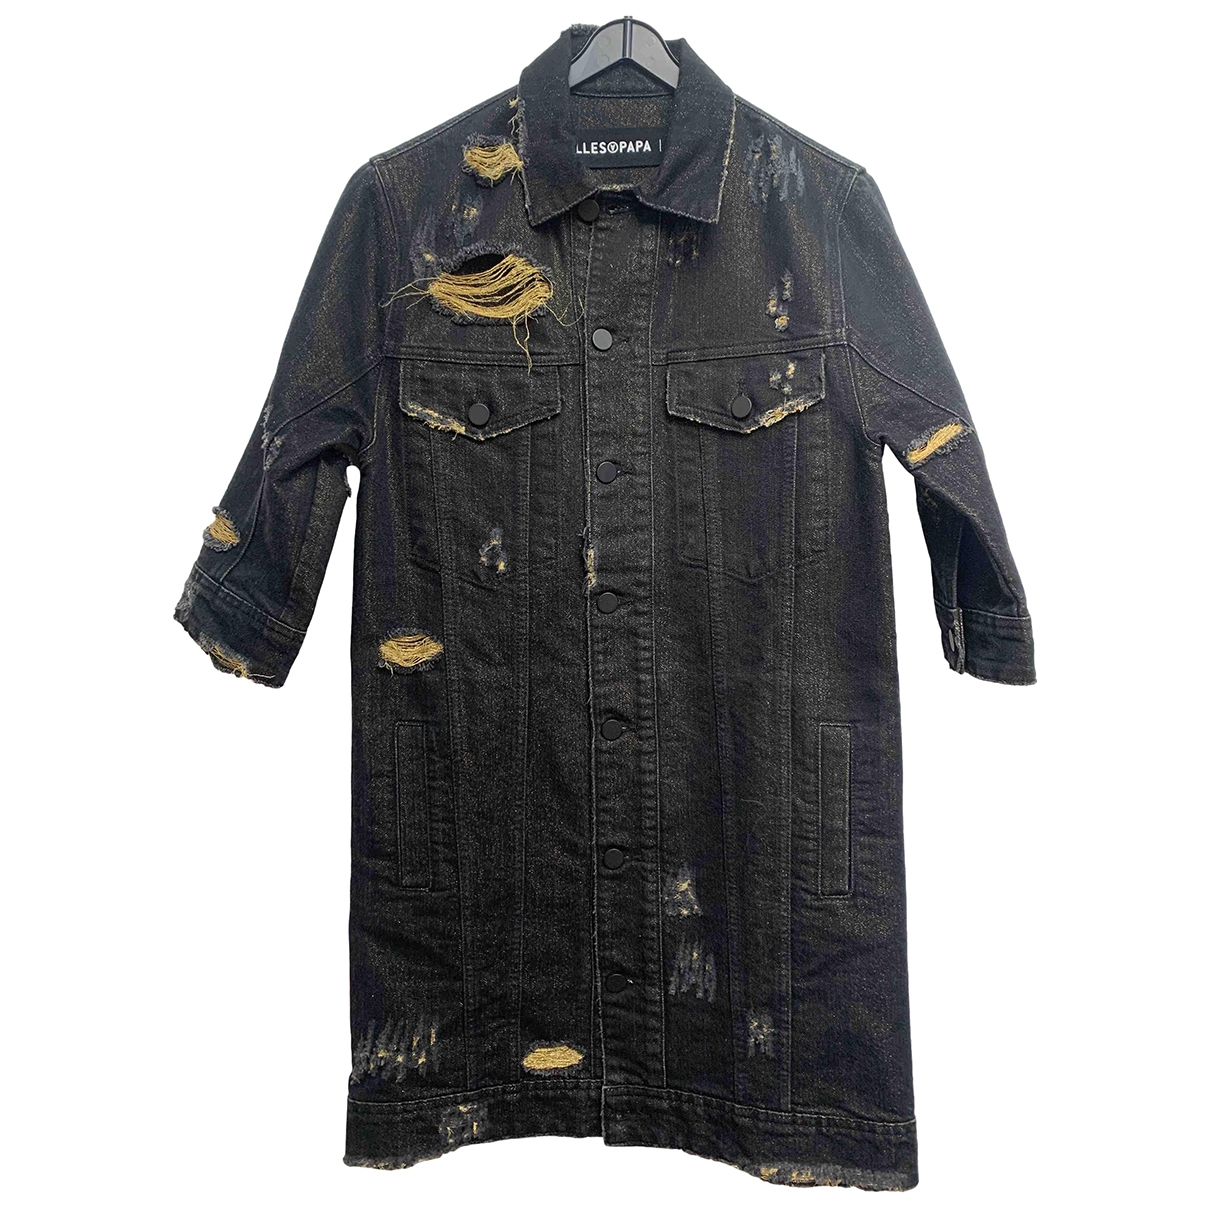 Filles A Papa \N Kleid in  Schwarz Denim - Jeans